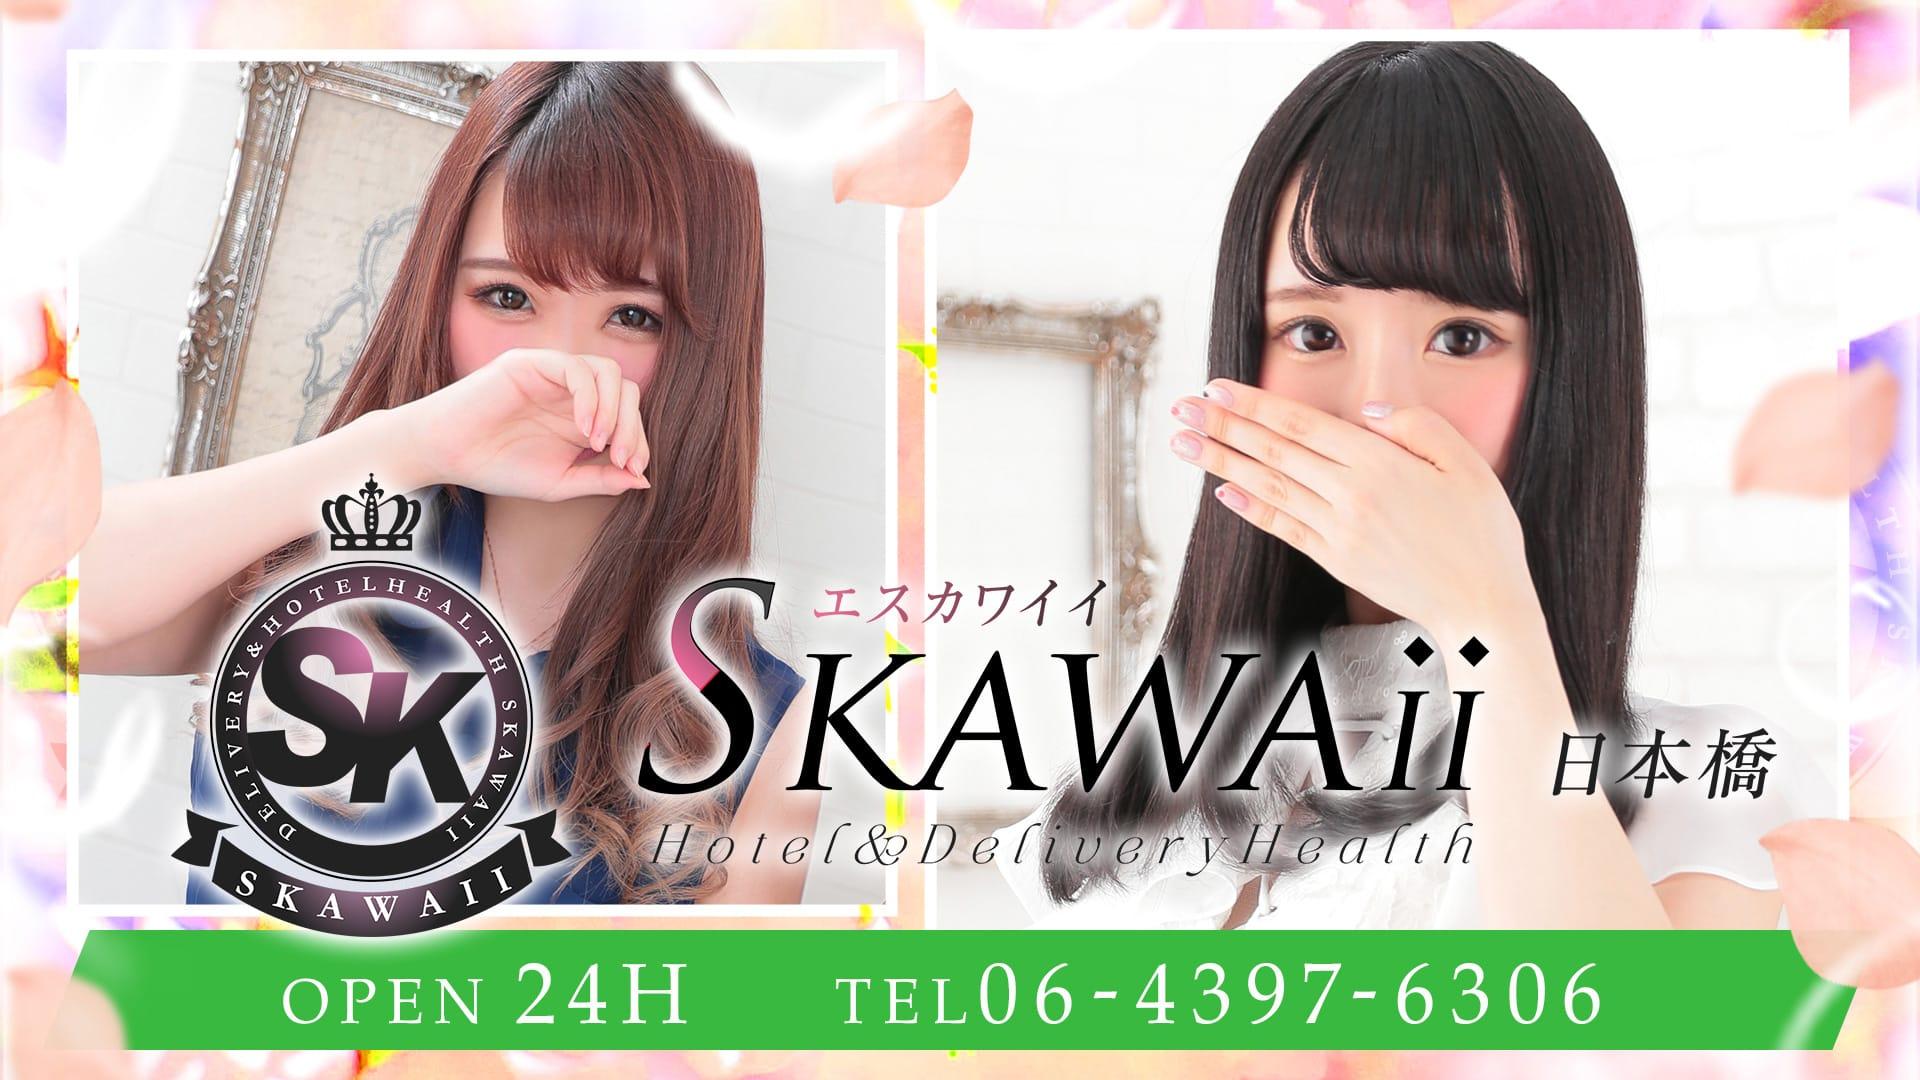 Skawaii(エスカワ)日本橋